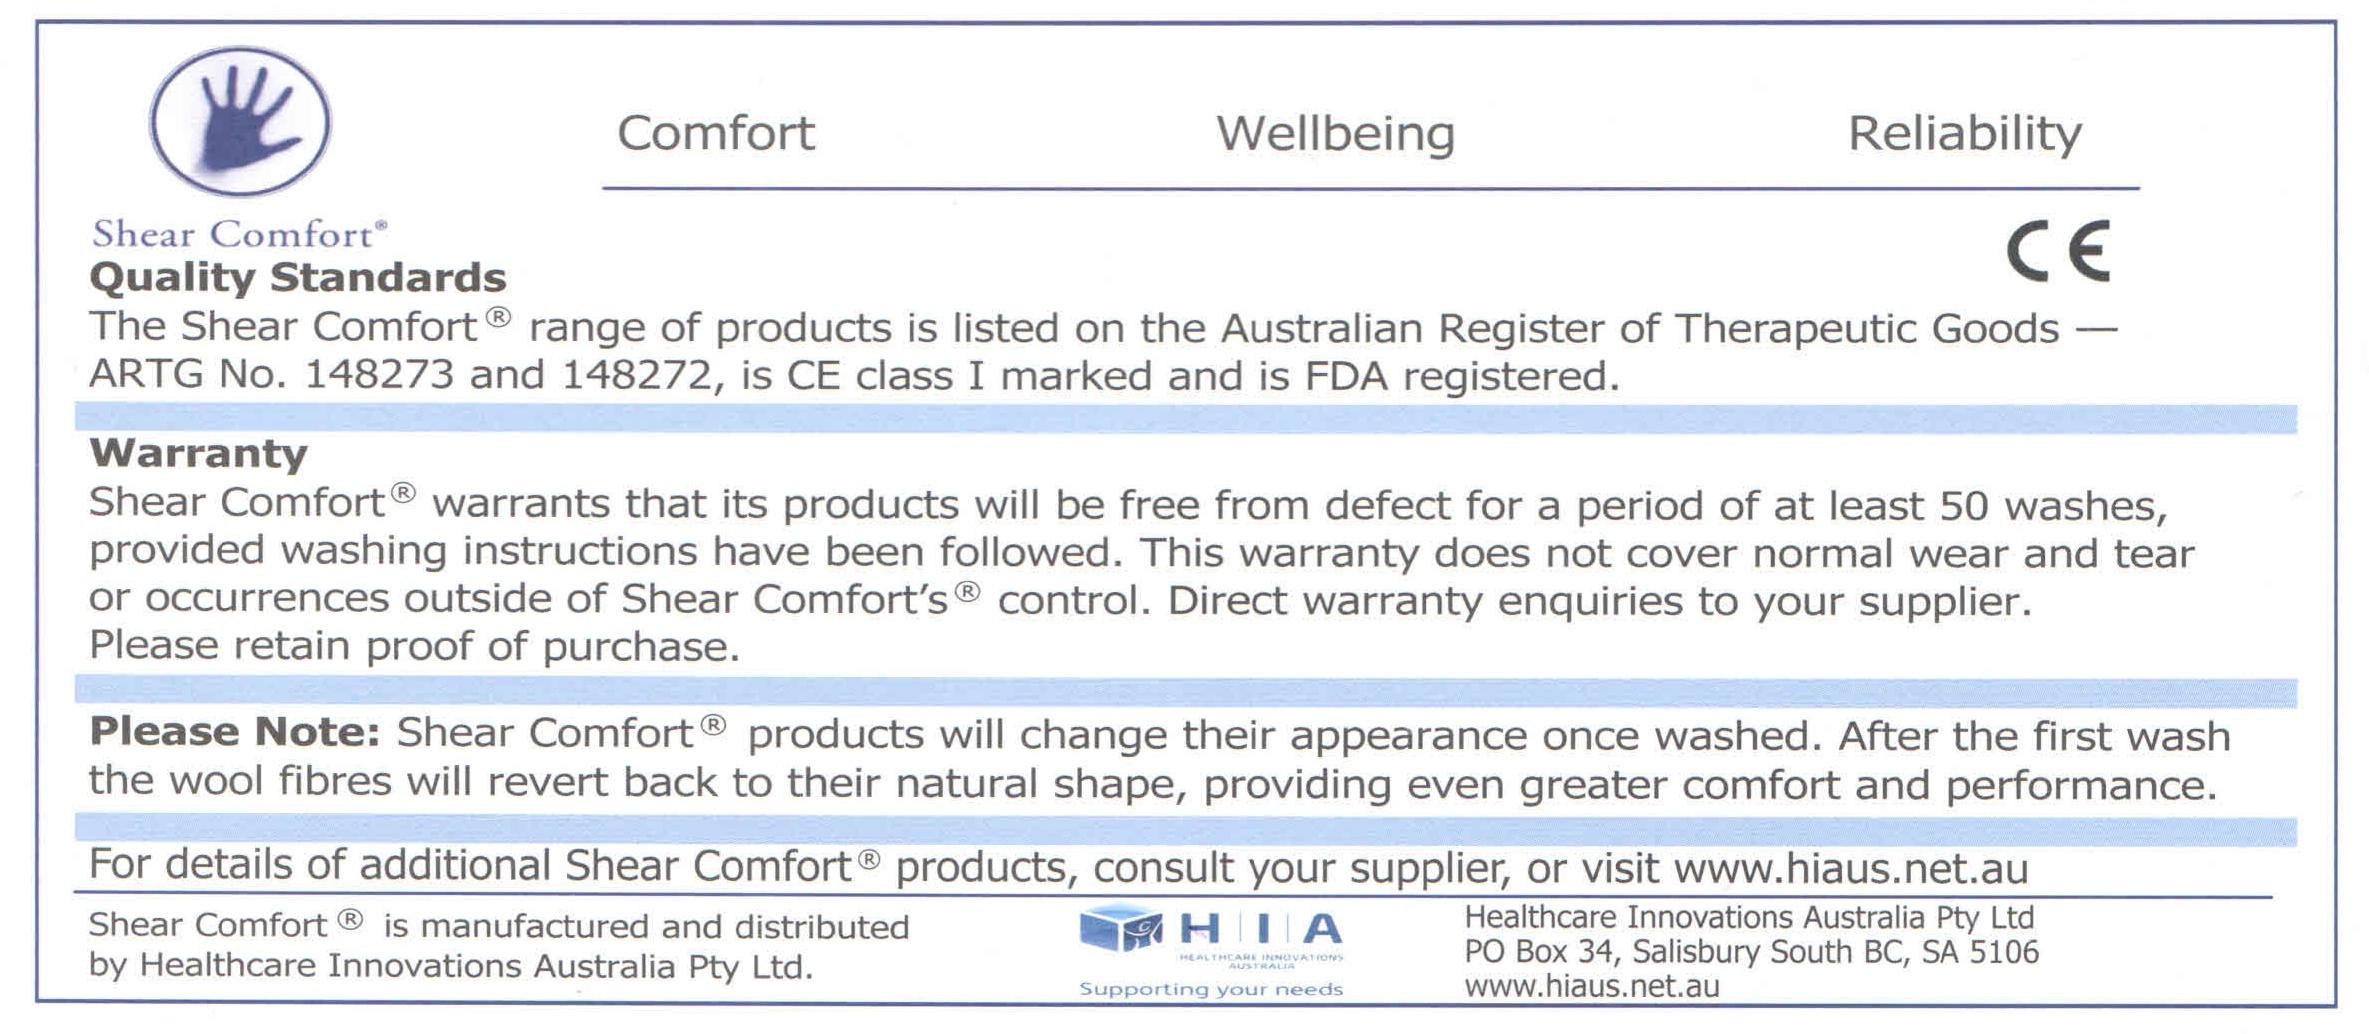 shear-comfort-warranty.jpg